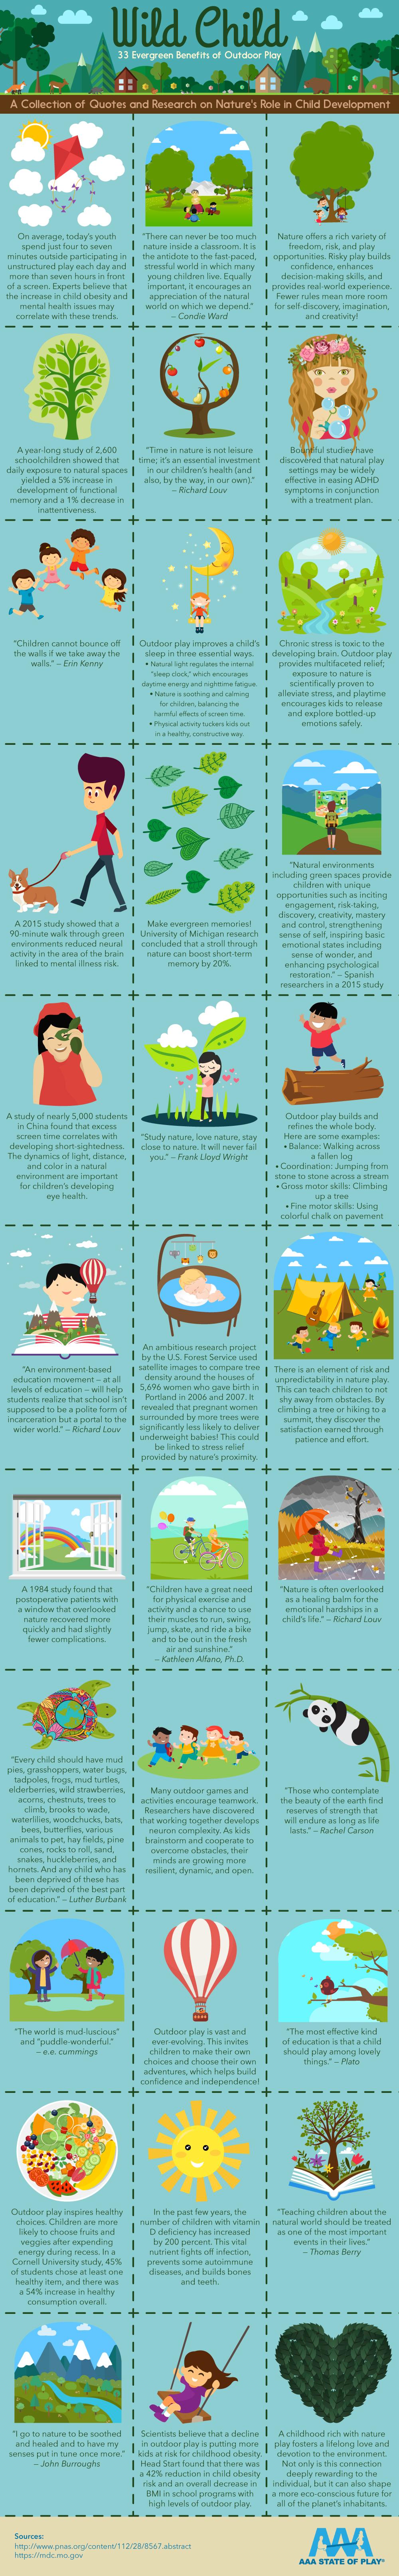 Wild Child: 33 Evergreen Benefits of Outdoor Play - AAAStateofPlay.com - Infographic